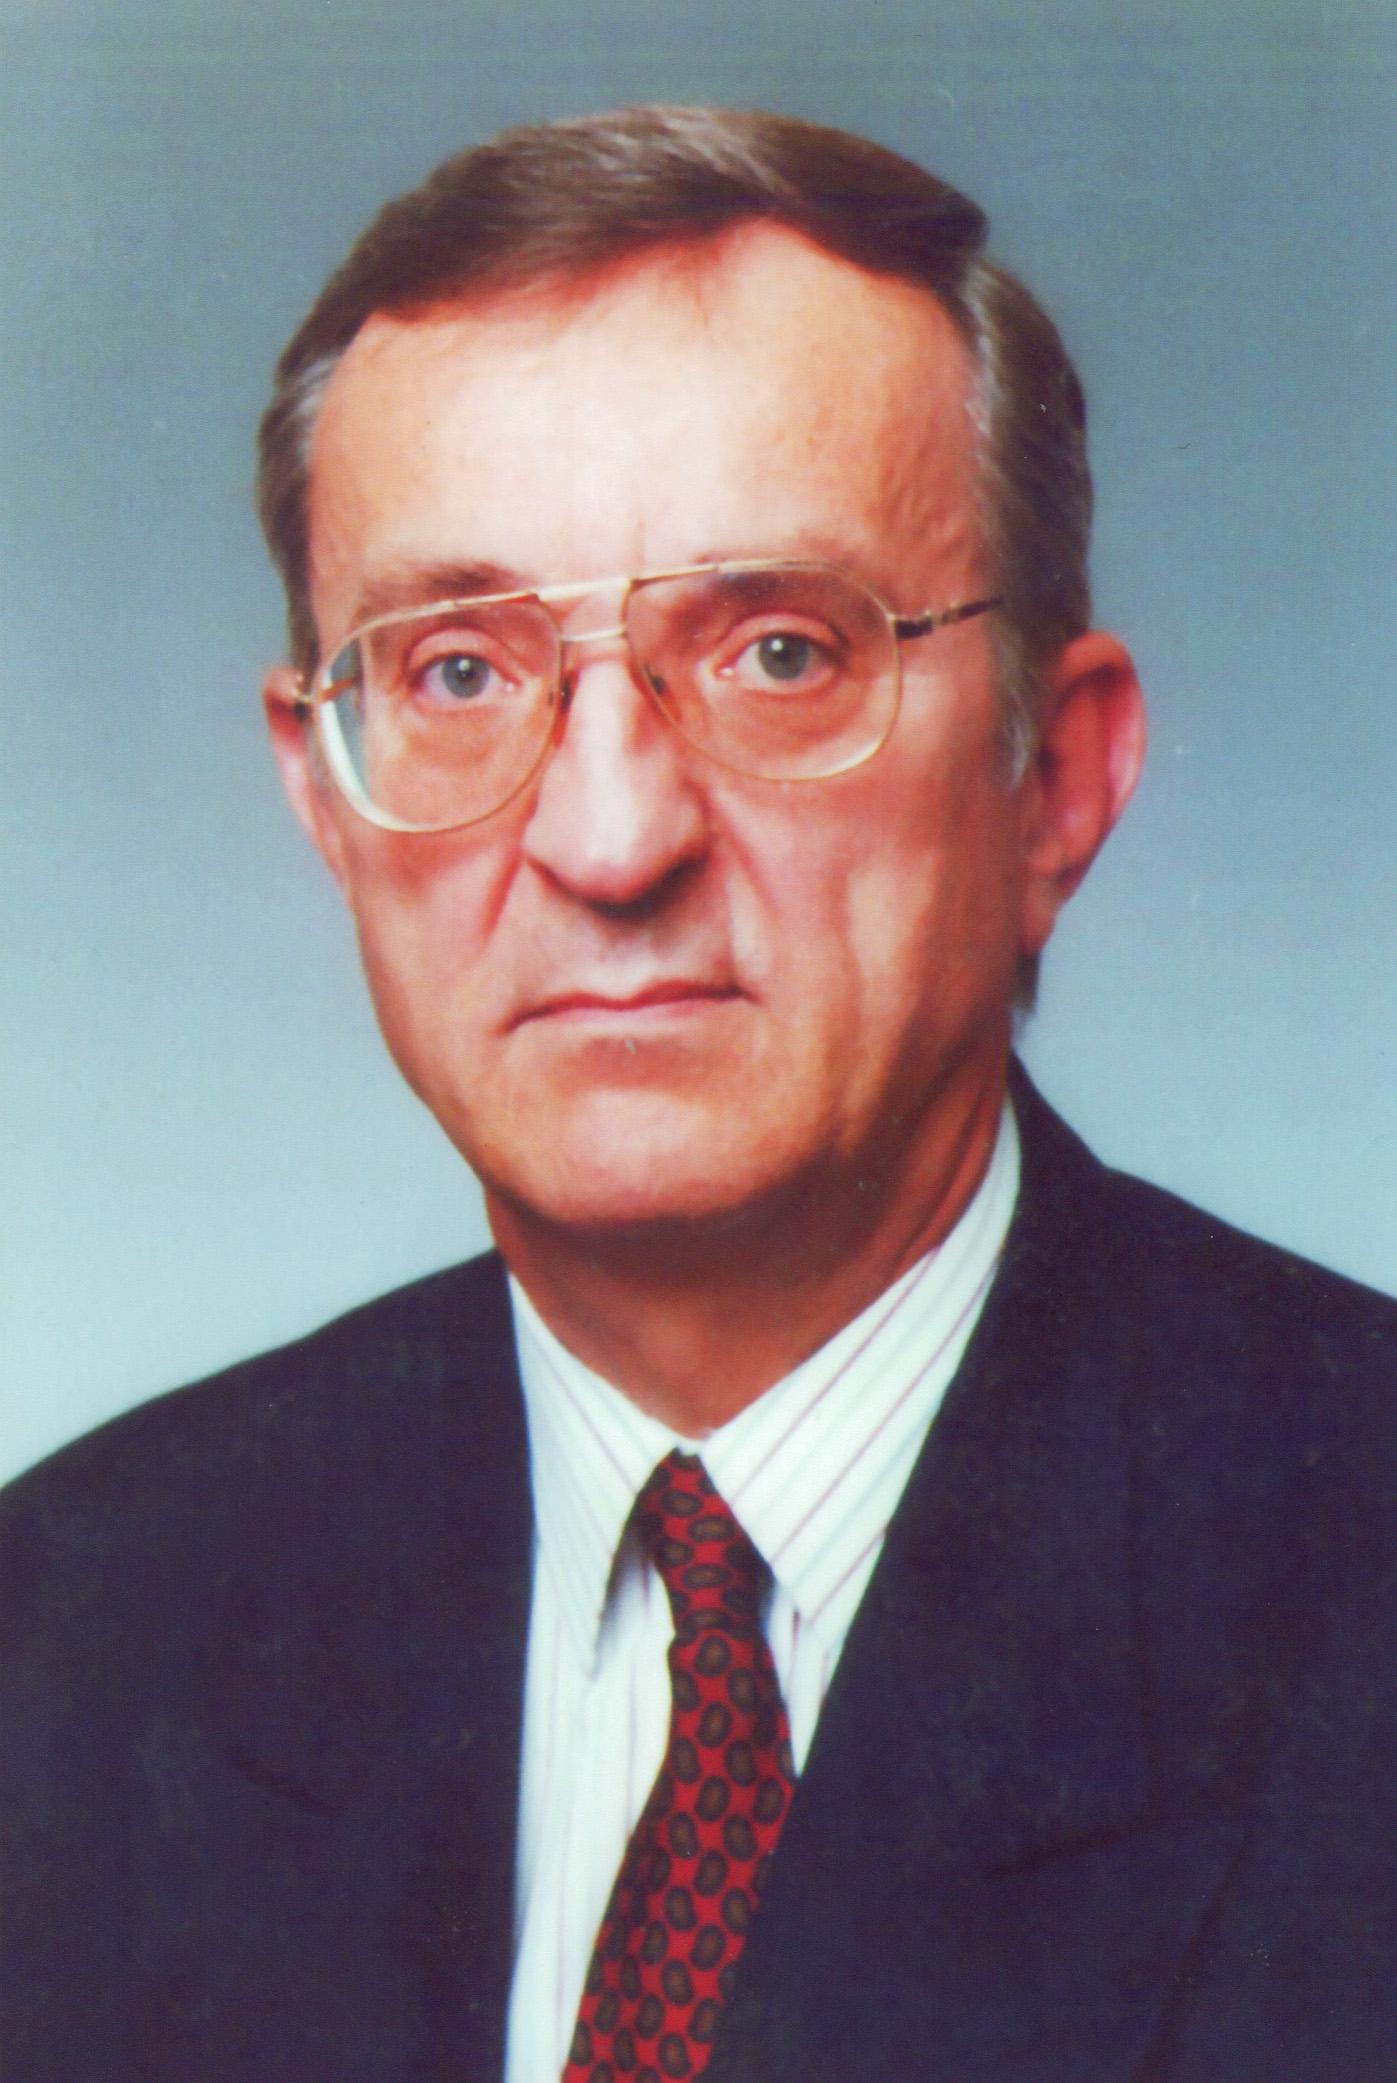 Миодраг Орлић